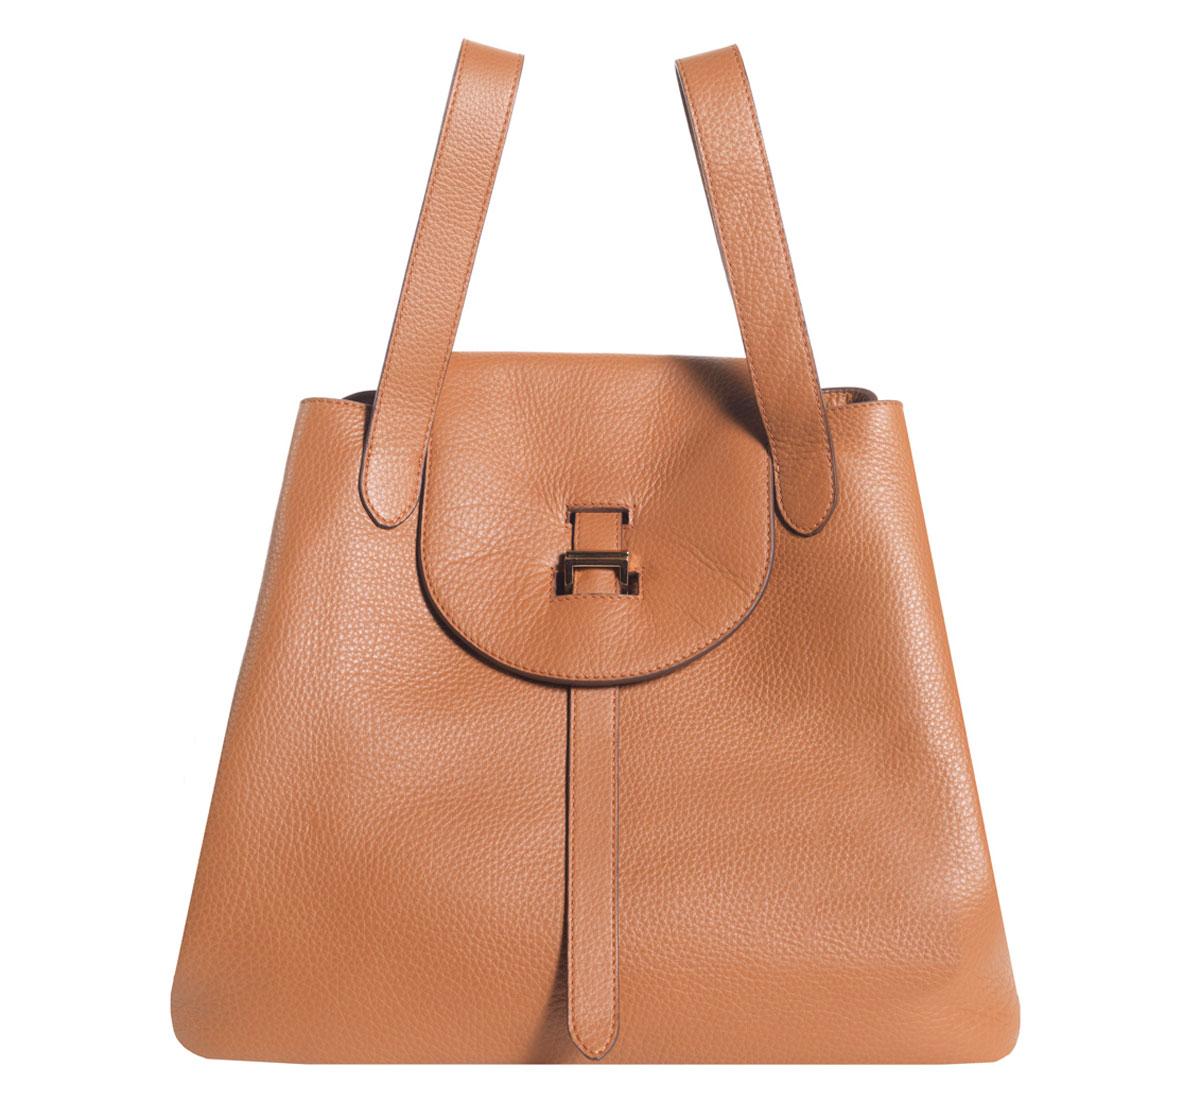 tan thela bag by meli melo roztayger designer